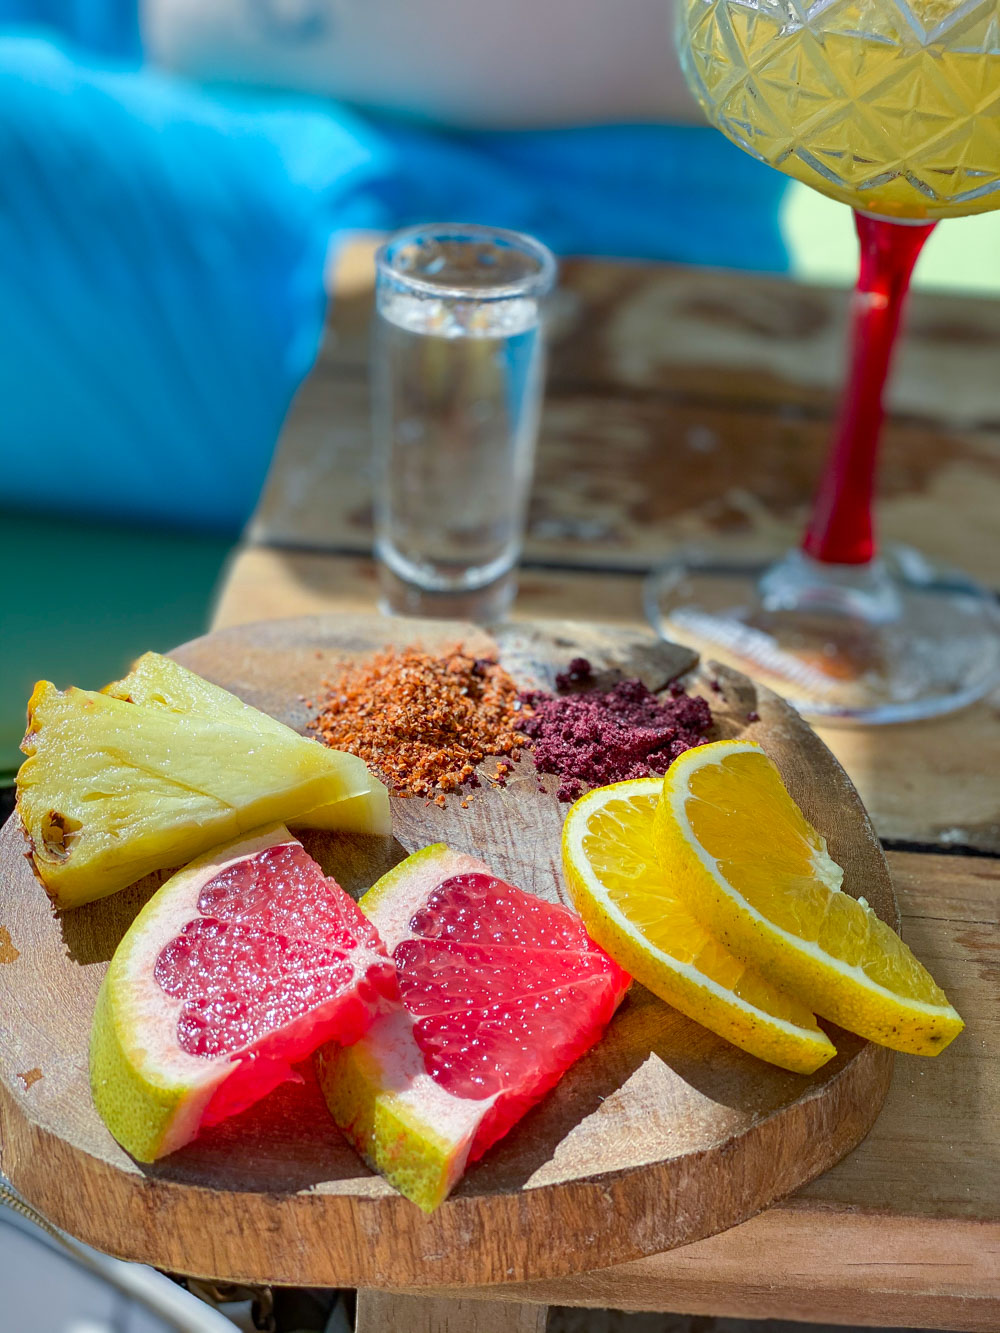 Various fruits and powders for drinking mezcal shots.